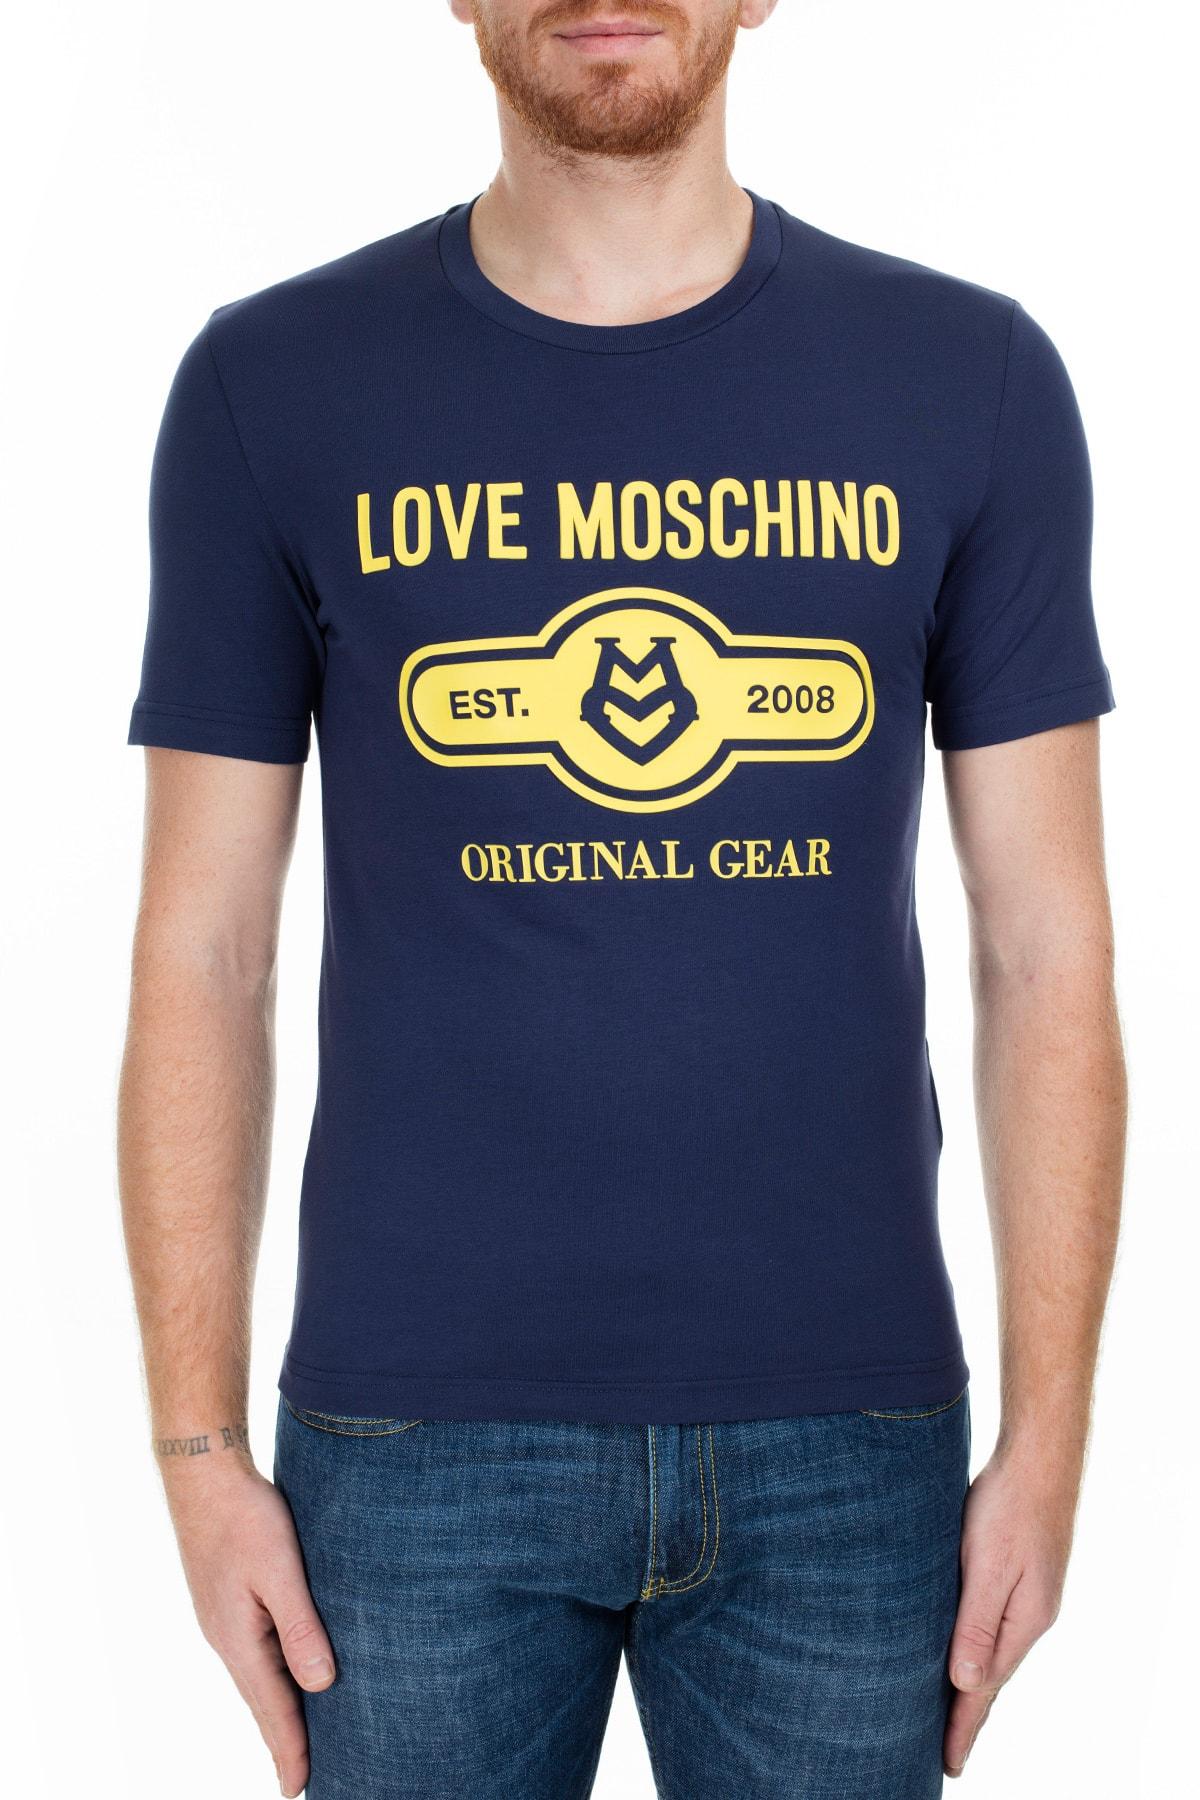 Love Moschino Erkek Lacivert T-Shirt S M47312Ie1811 Y61 1